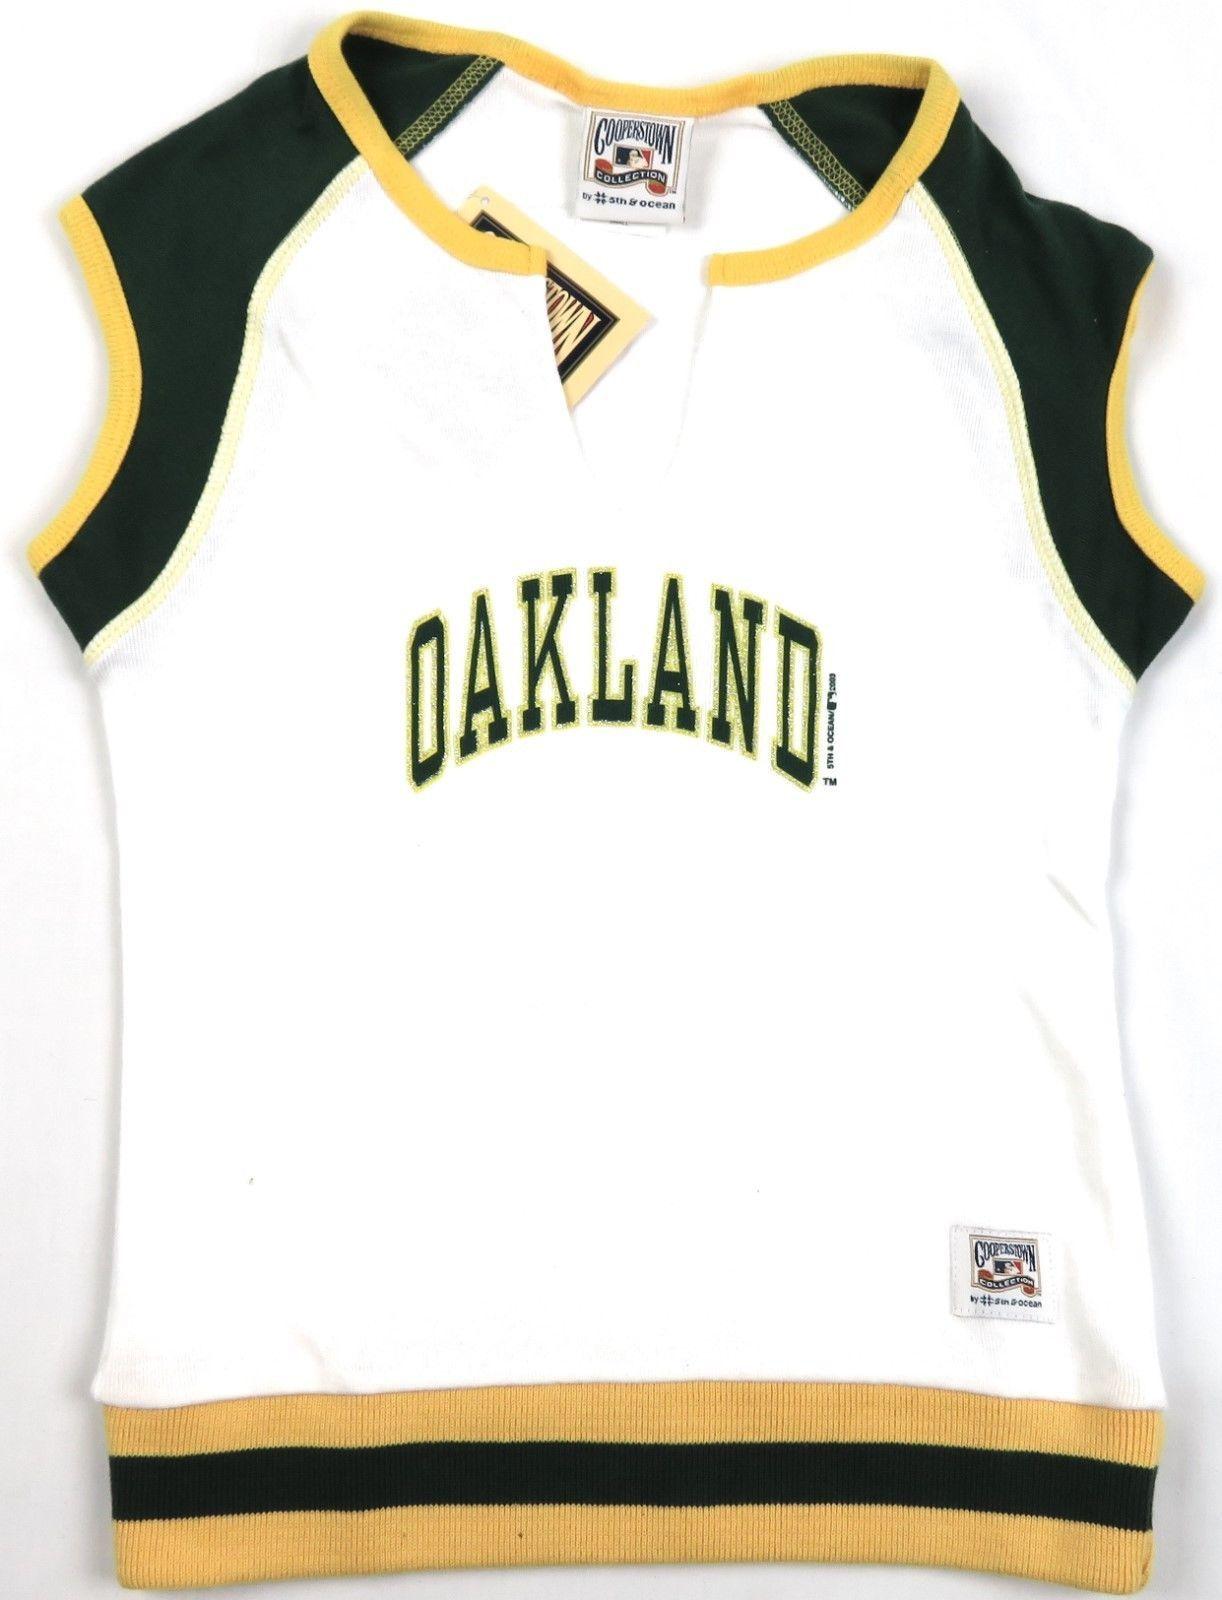 Junior Women's Oakland Athletics Shirt MLB A's Cooperstown Top Short Sleeve NEW